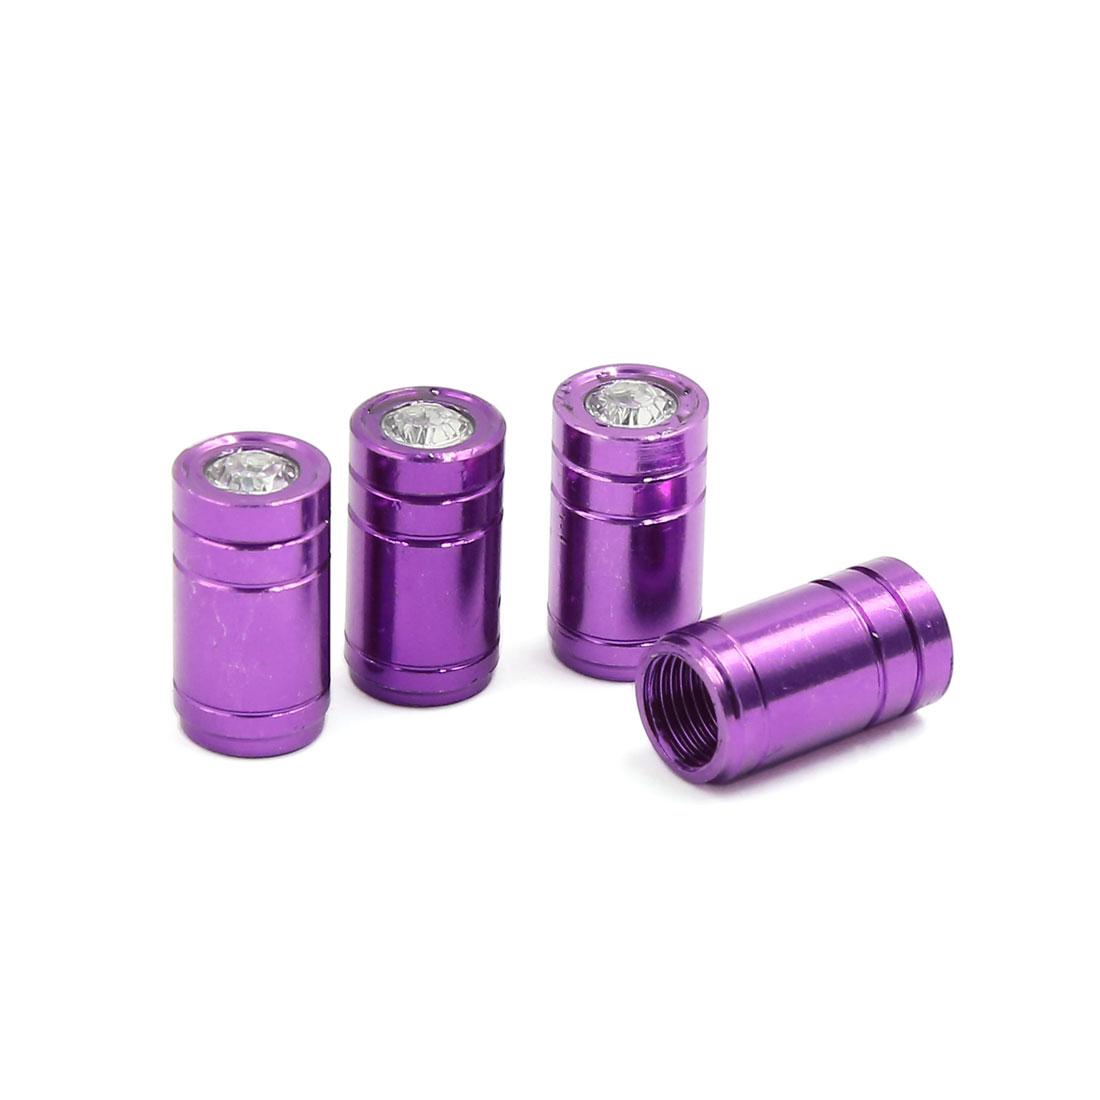 4 Pcs Purple Plastic Faux Crystal Decor Car Tire Wheel Valve Cap Cover 7mm Dia